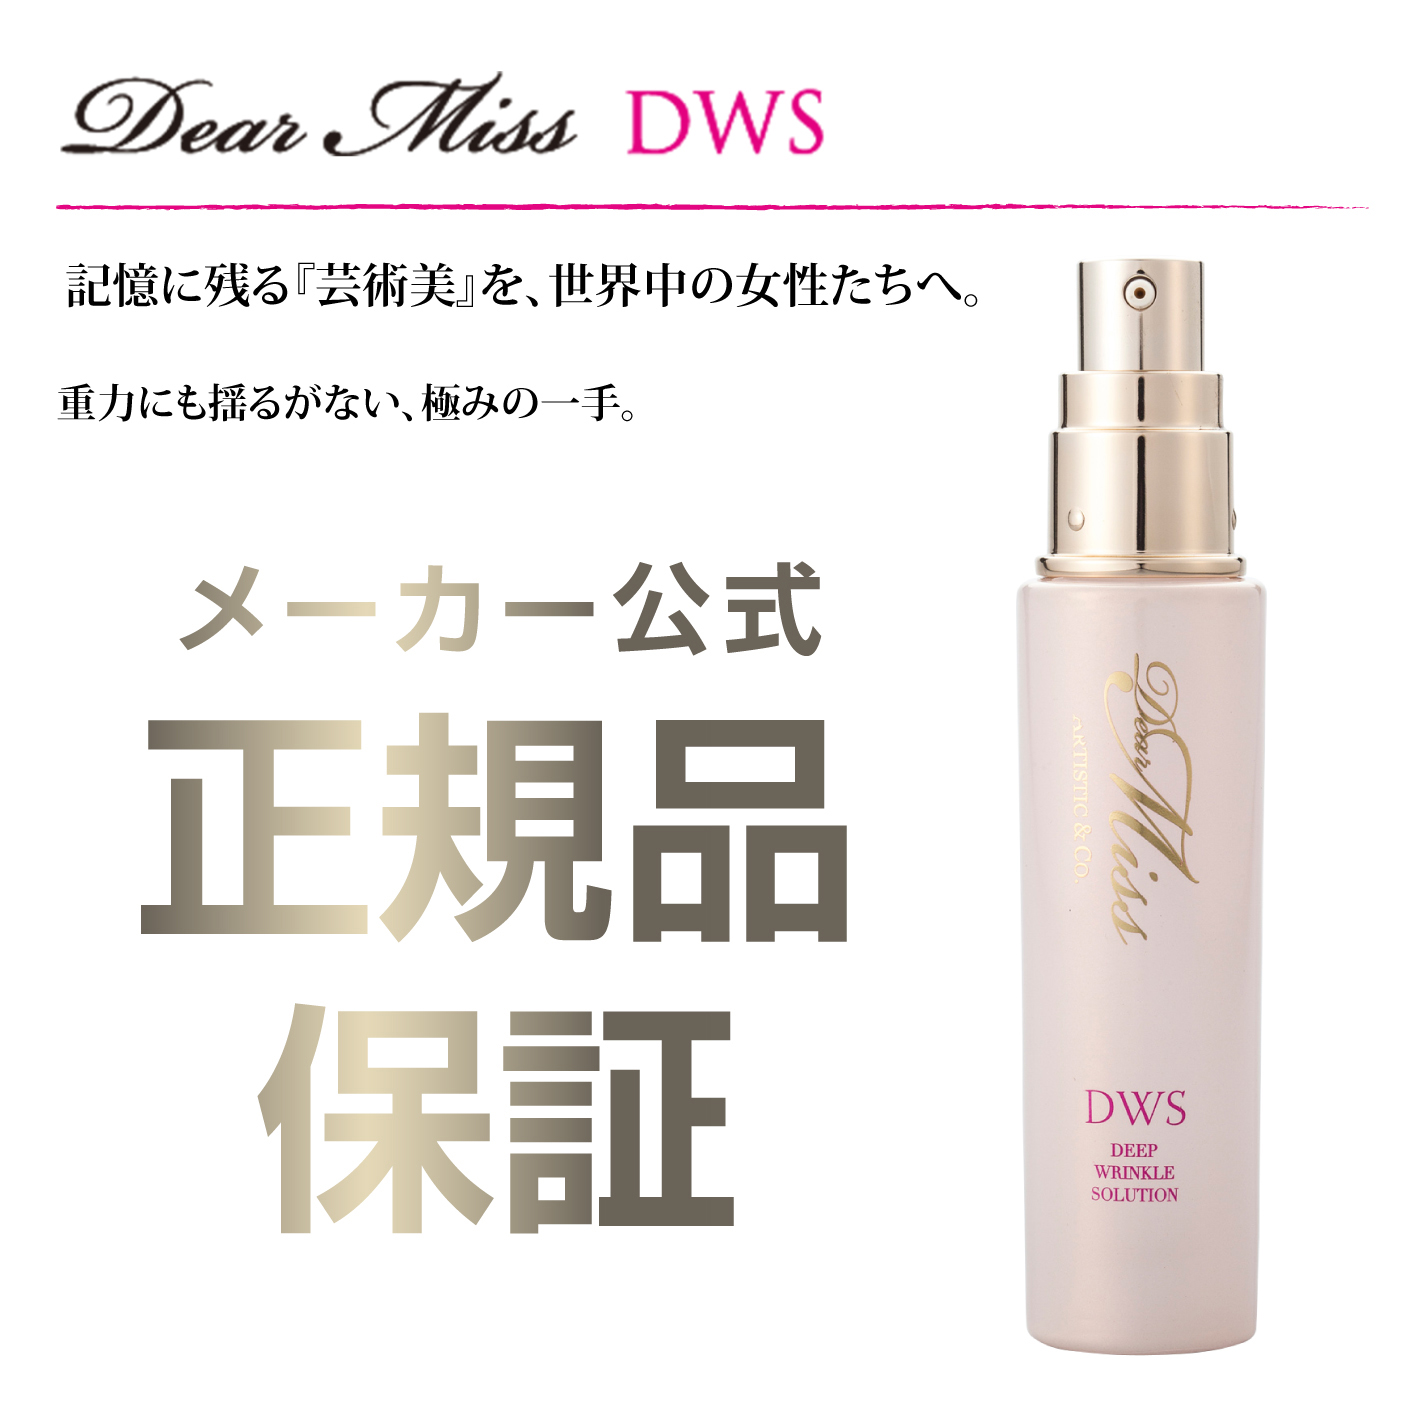 DWS ディアミスディアミス DWS, 玉子屋やまたか:3390fedd --- officewill.xsrv.jp